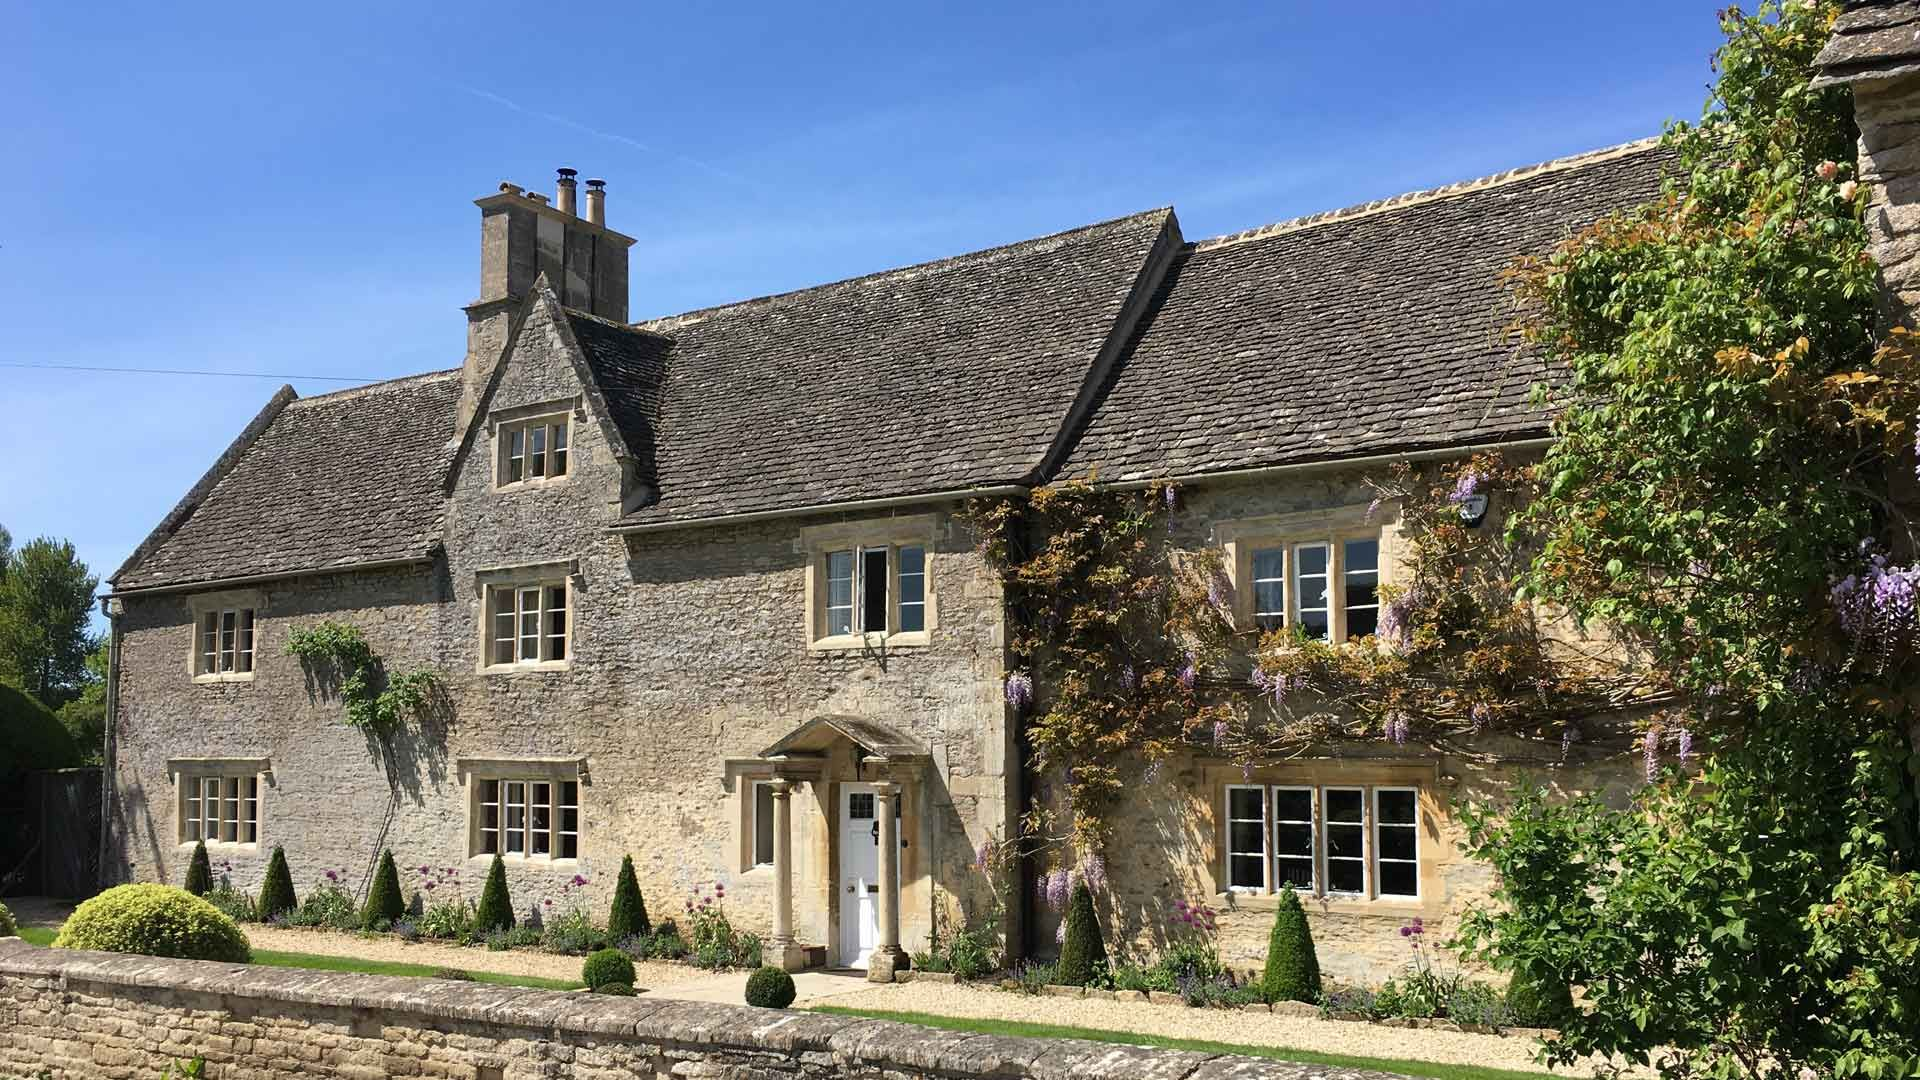 Manor Farm - StayCotswold